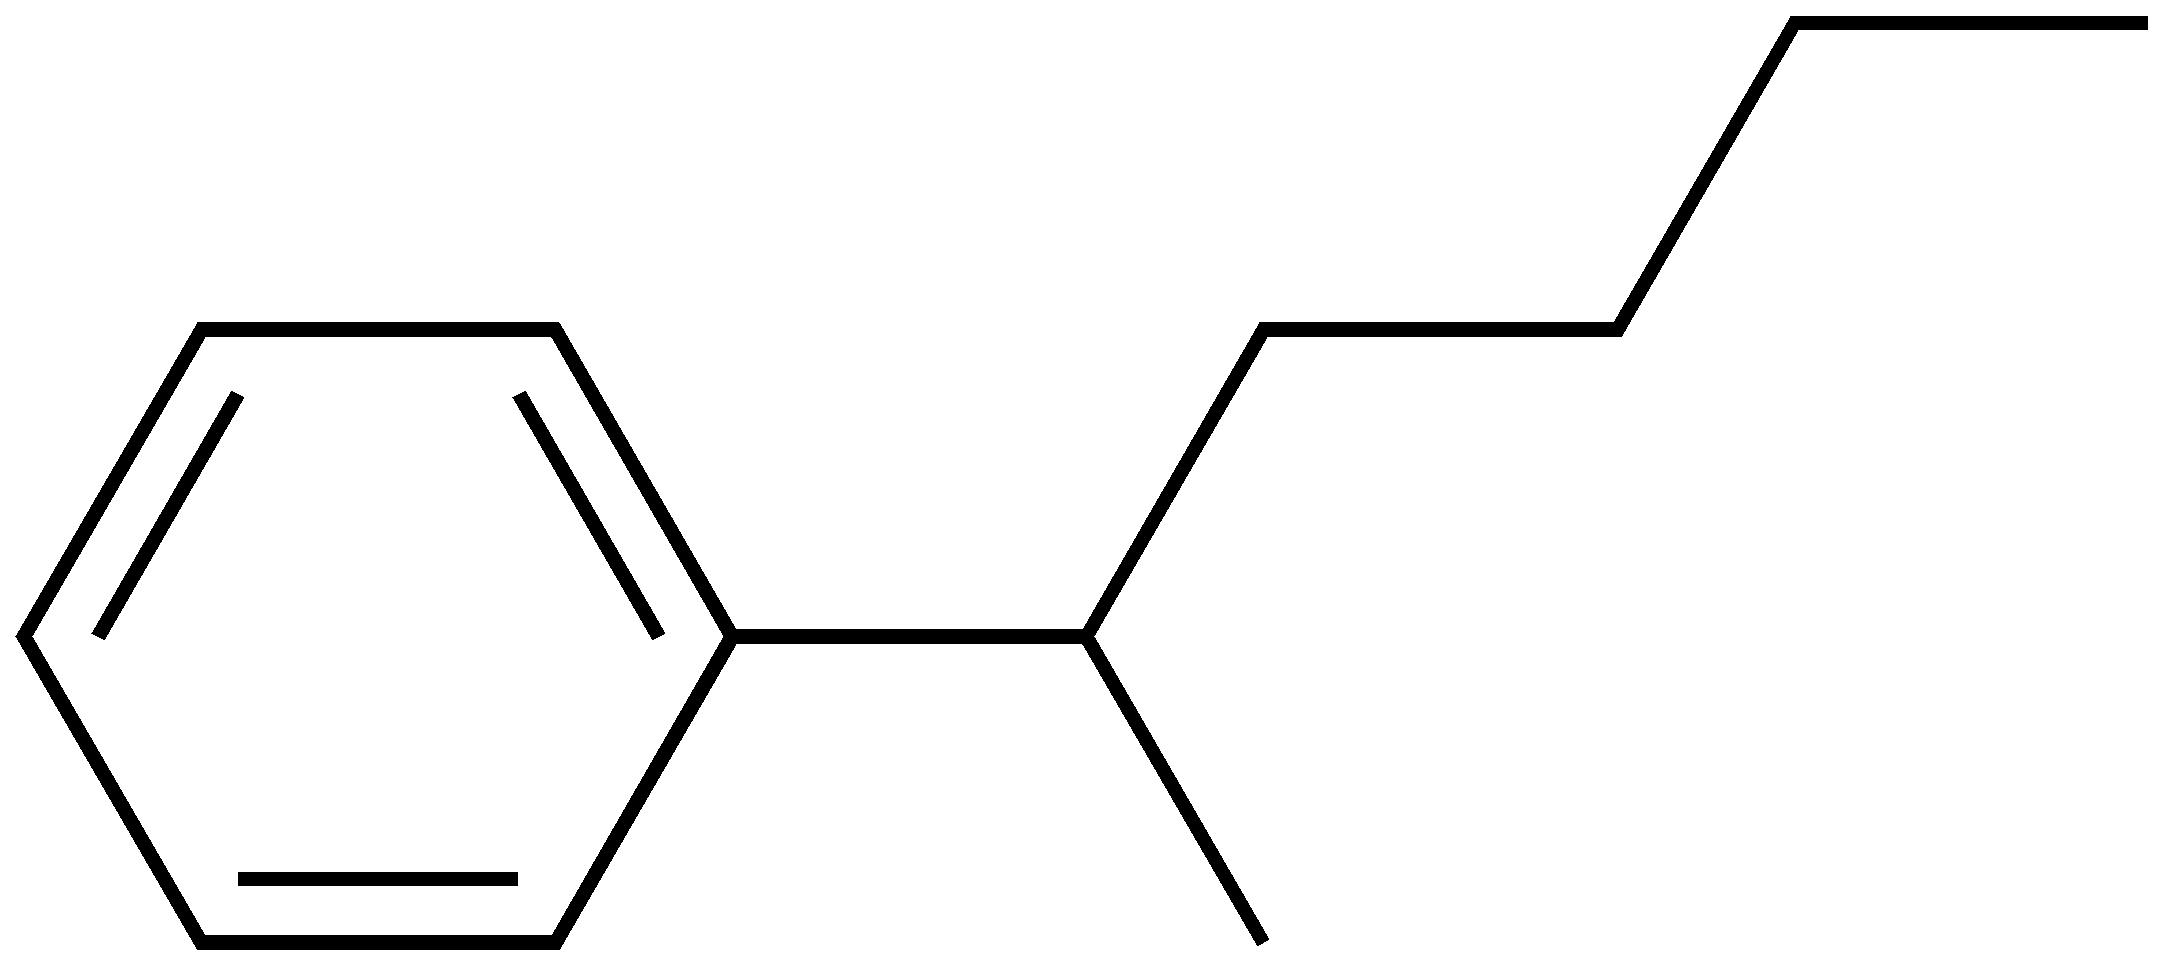 2-Phenylhexane - Wikipedia